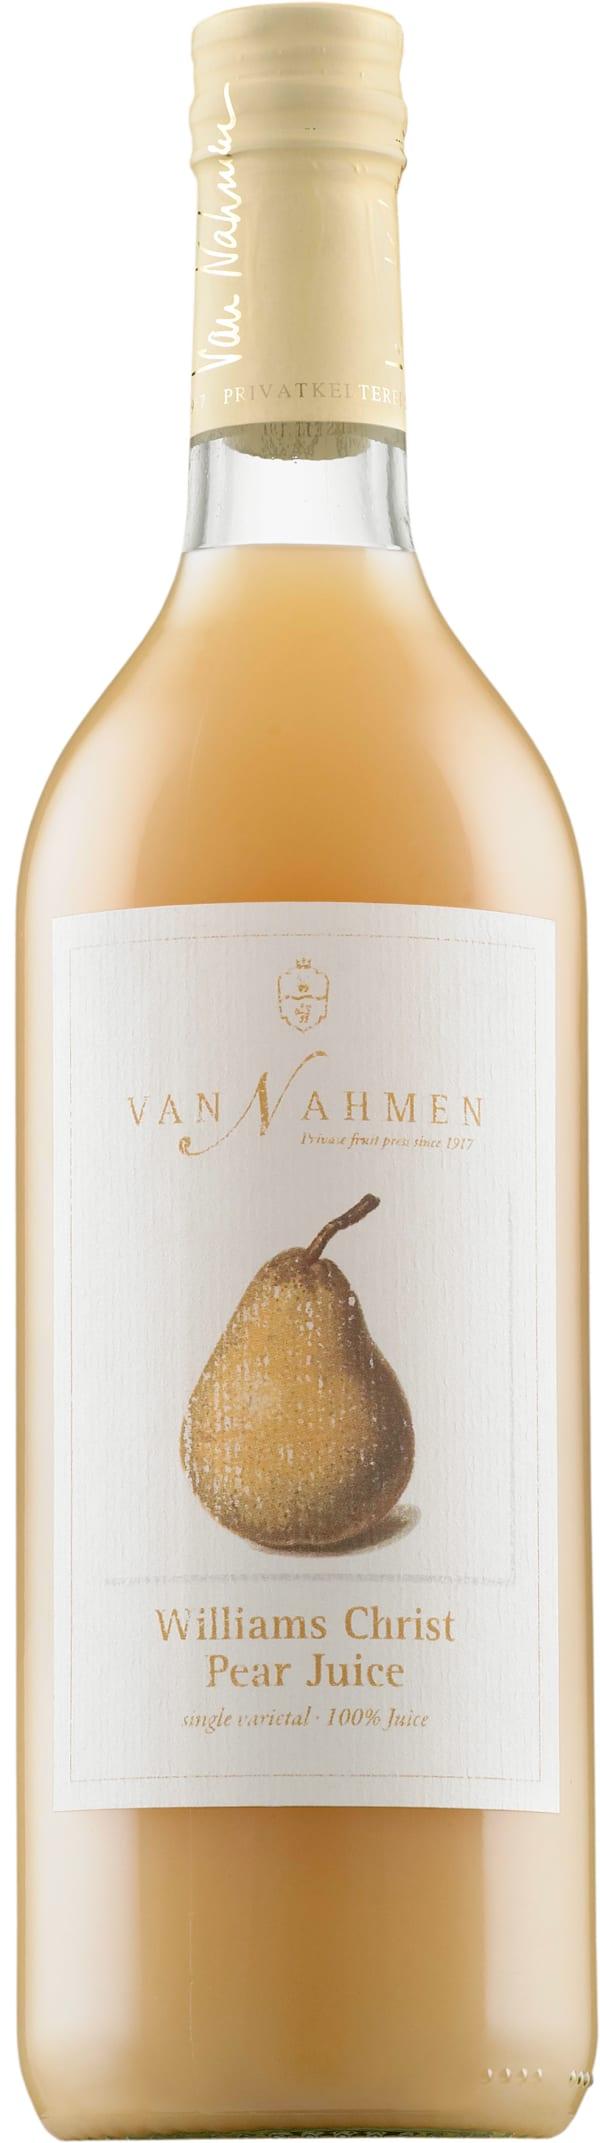 Van Nahmen Williams Christ Pear Juice